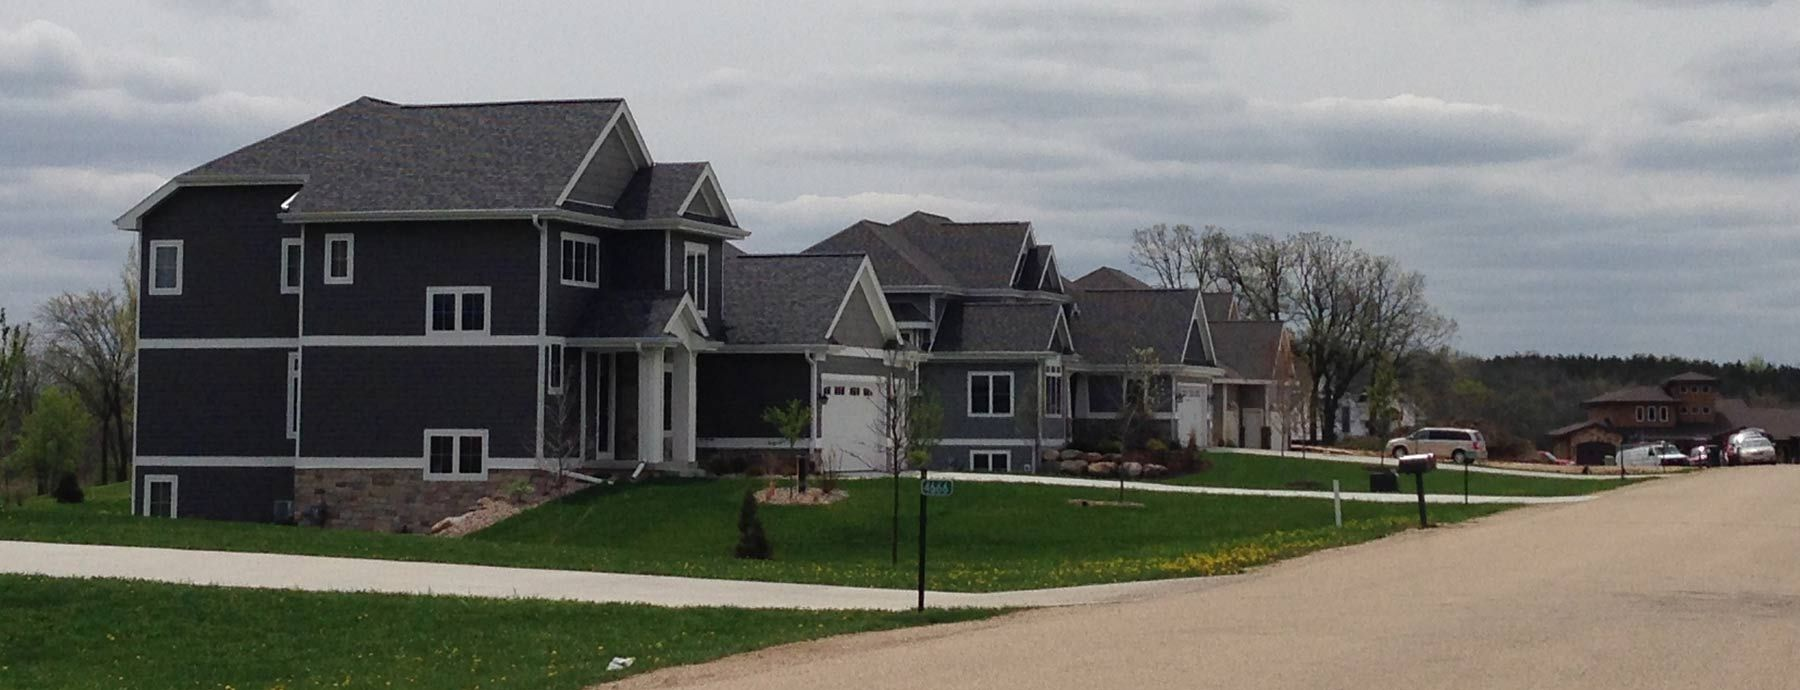 Residential Property Development - Chalet Meadows